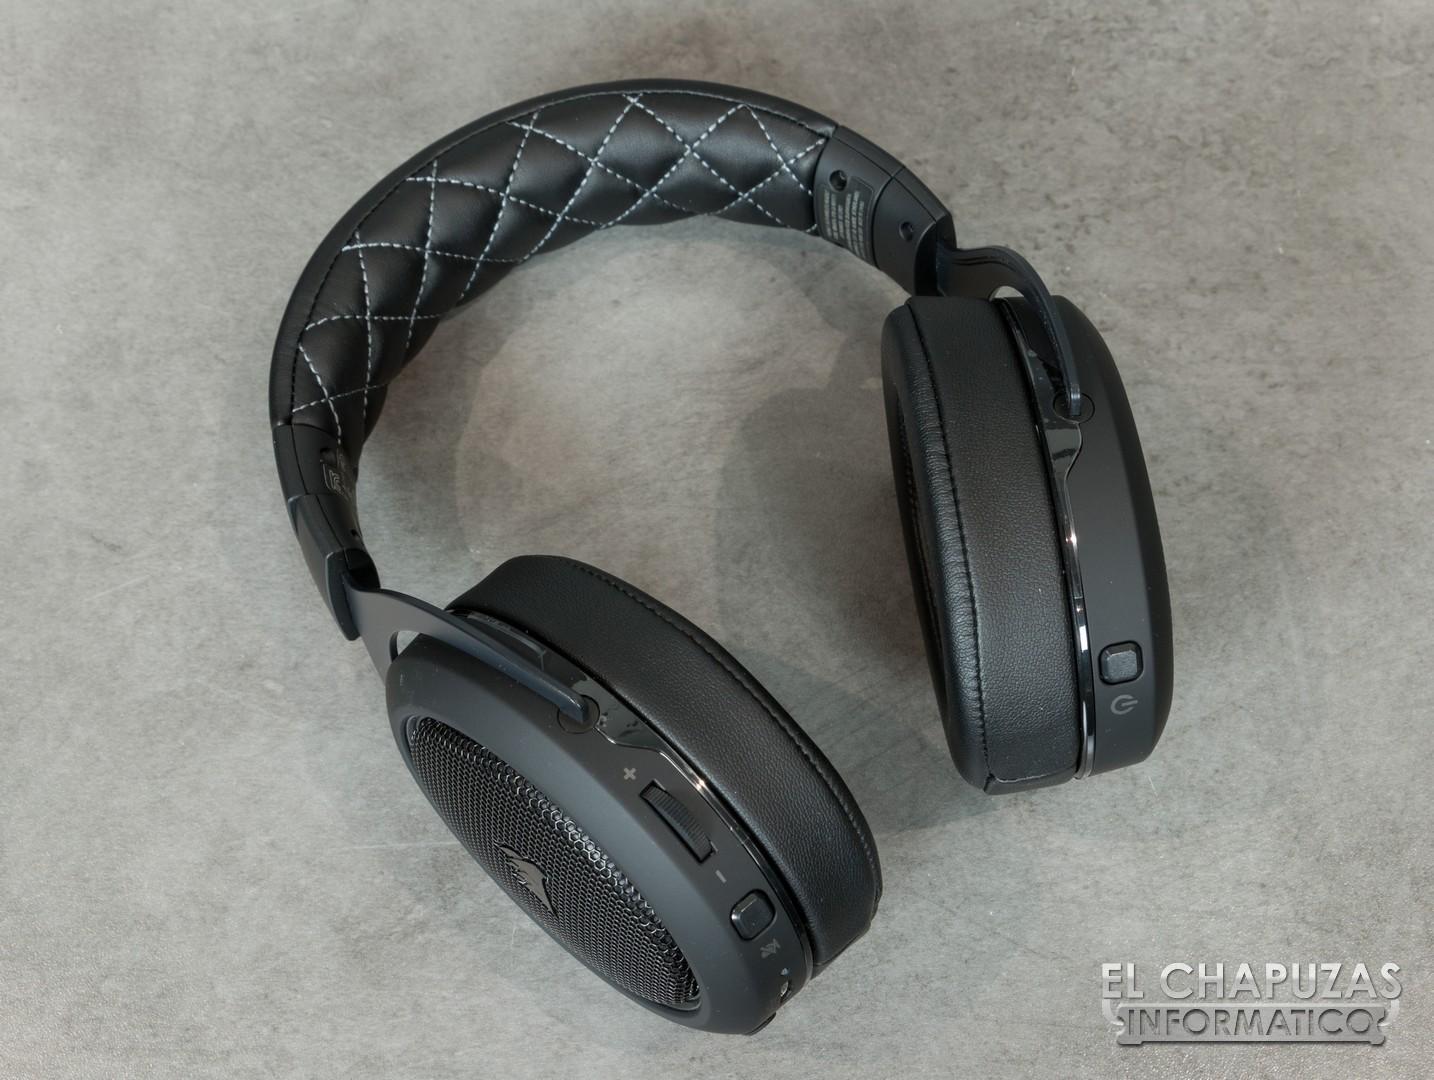 Ayuda/Guía para comprar Auriculares (Actualizado 2018)